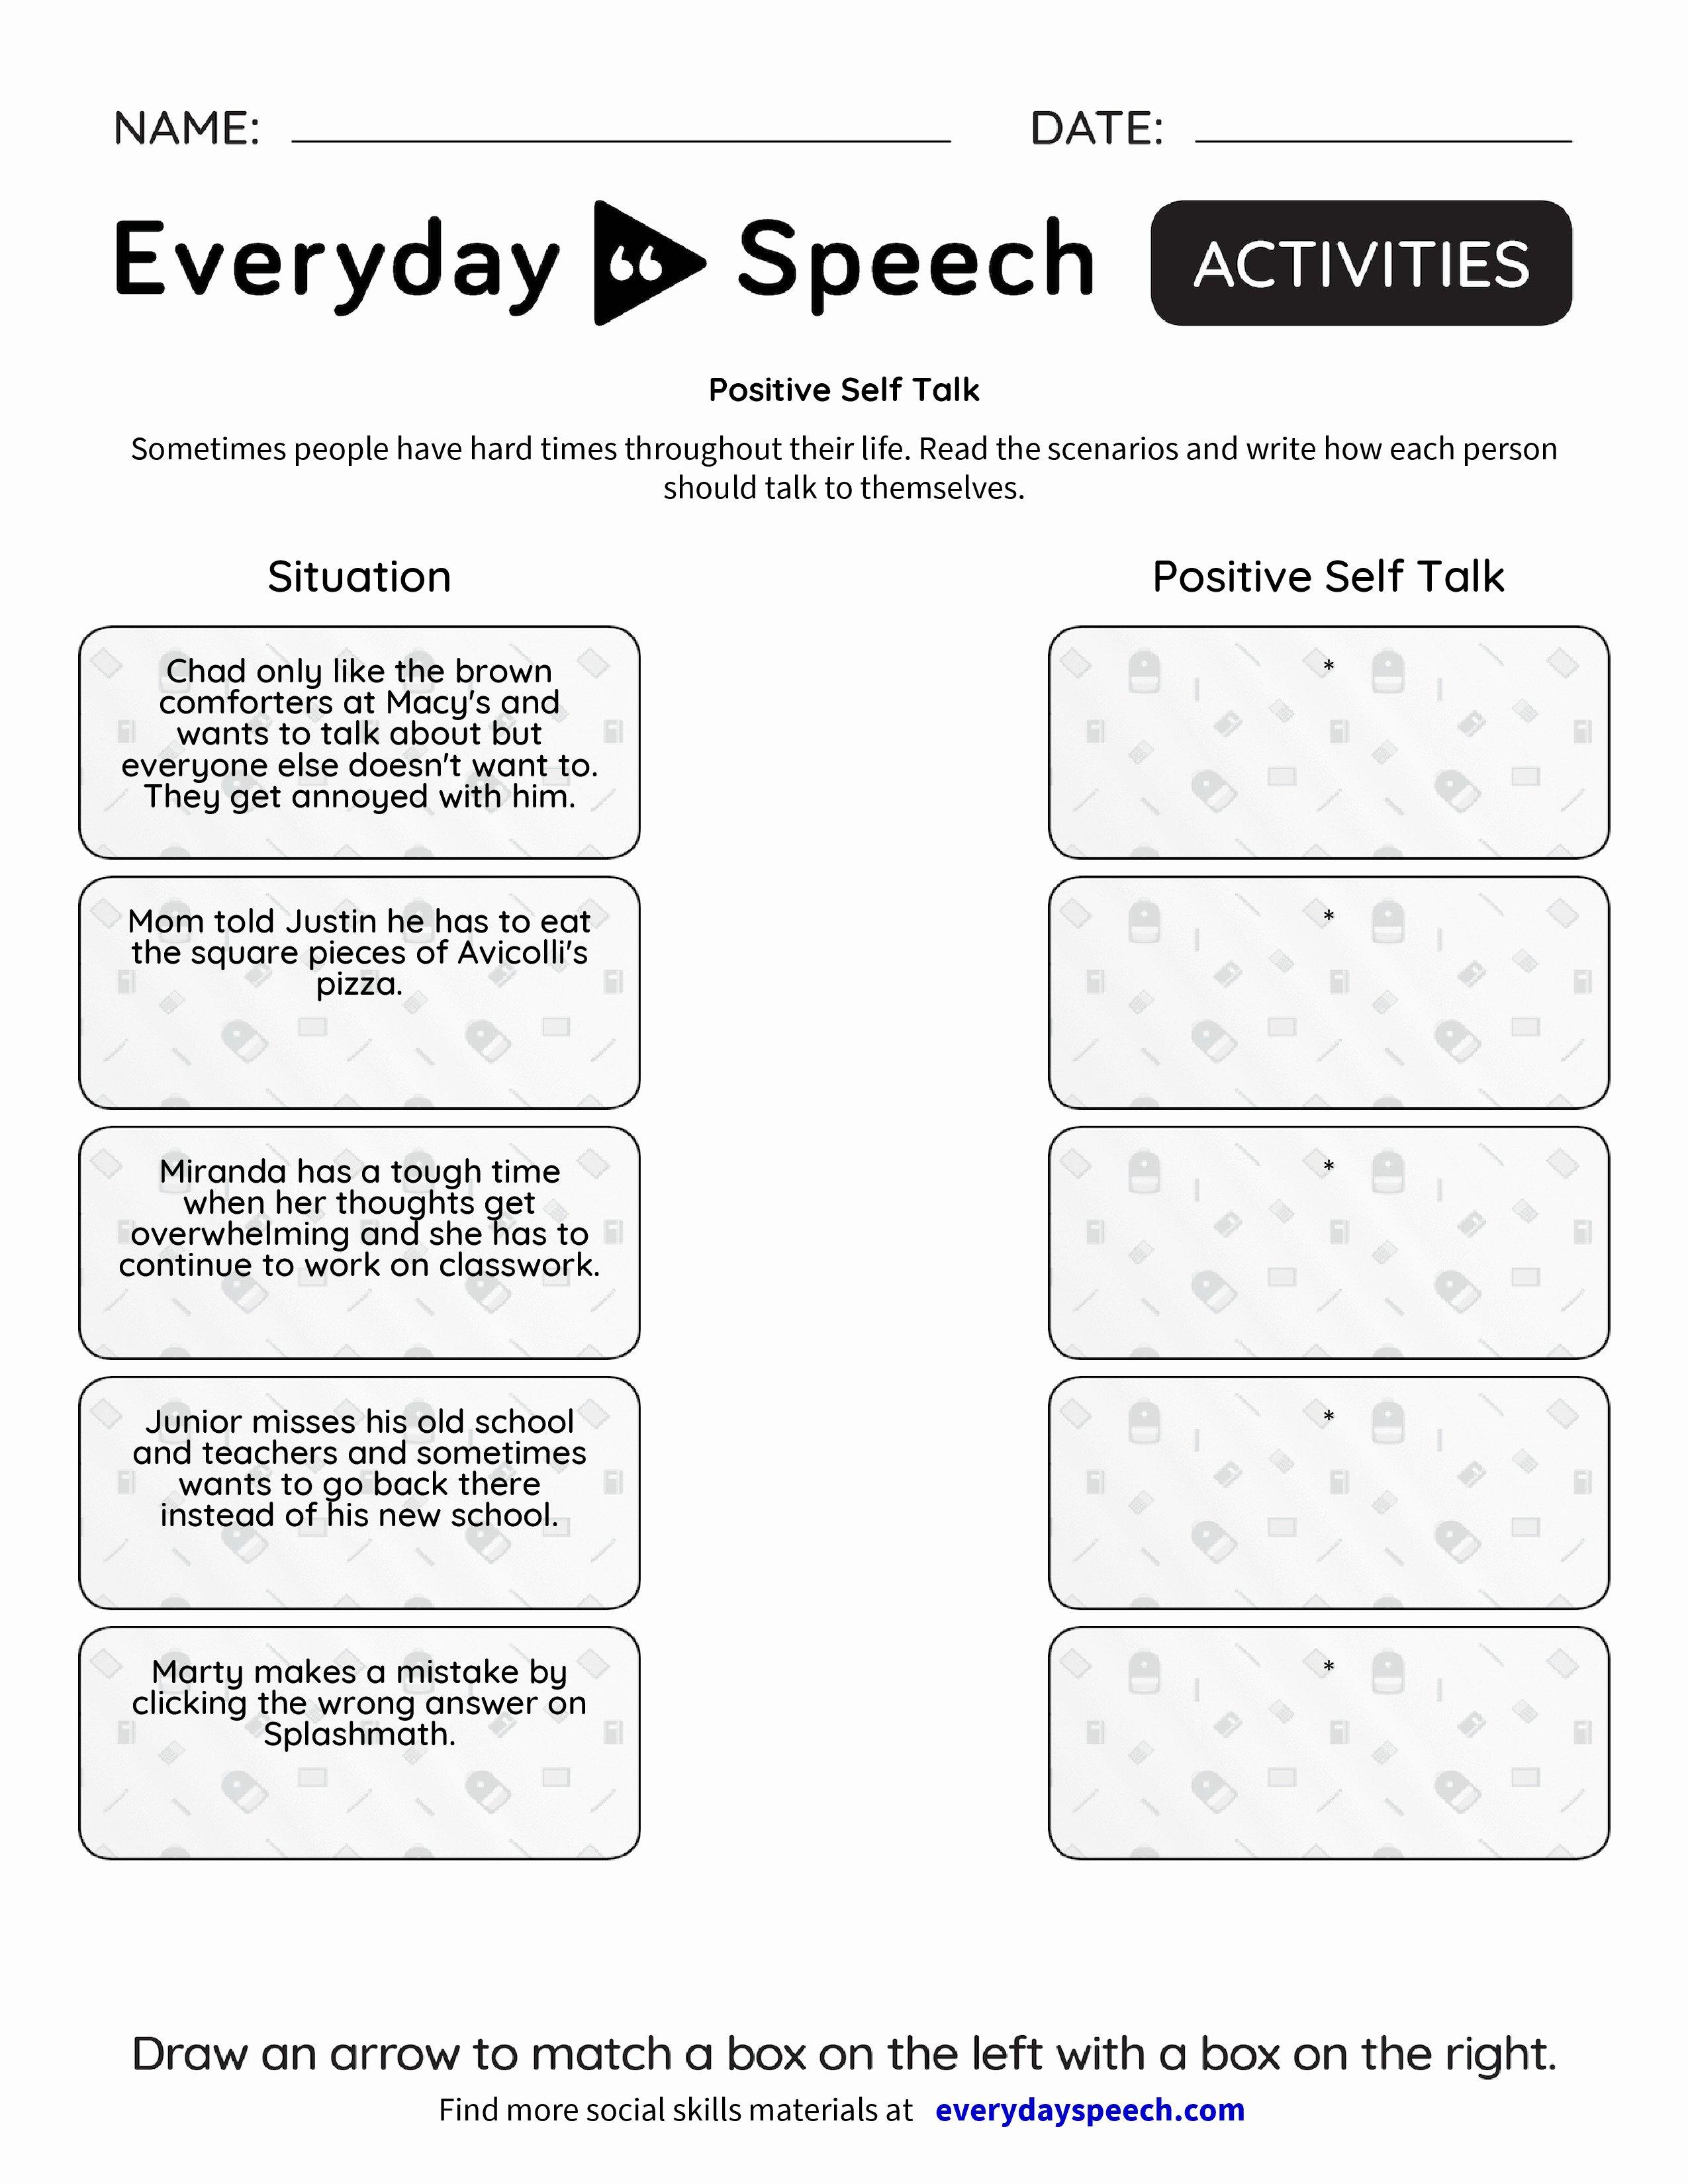 Positive Self Talk Worksheet Unique Positive Self Talk Everyday Speech Everyday Speech